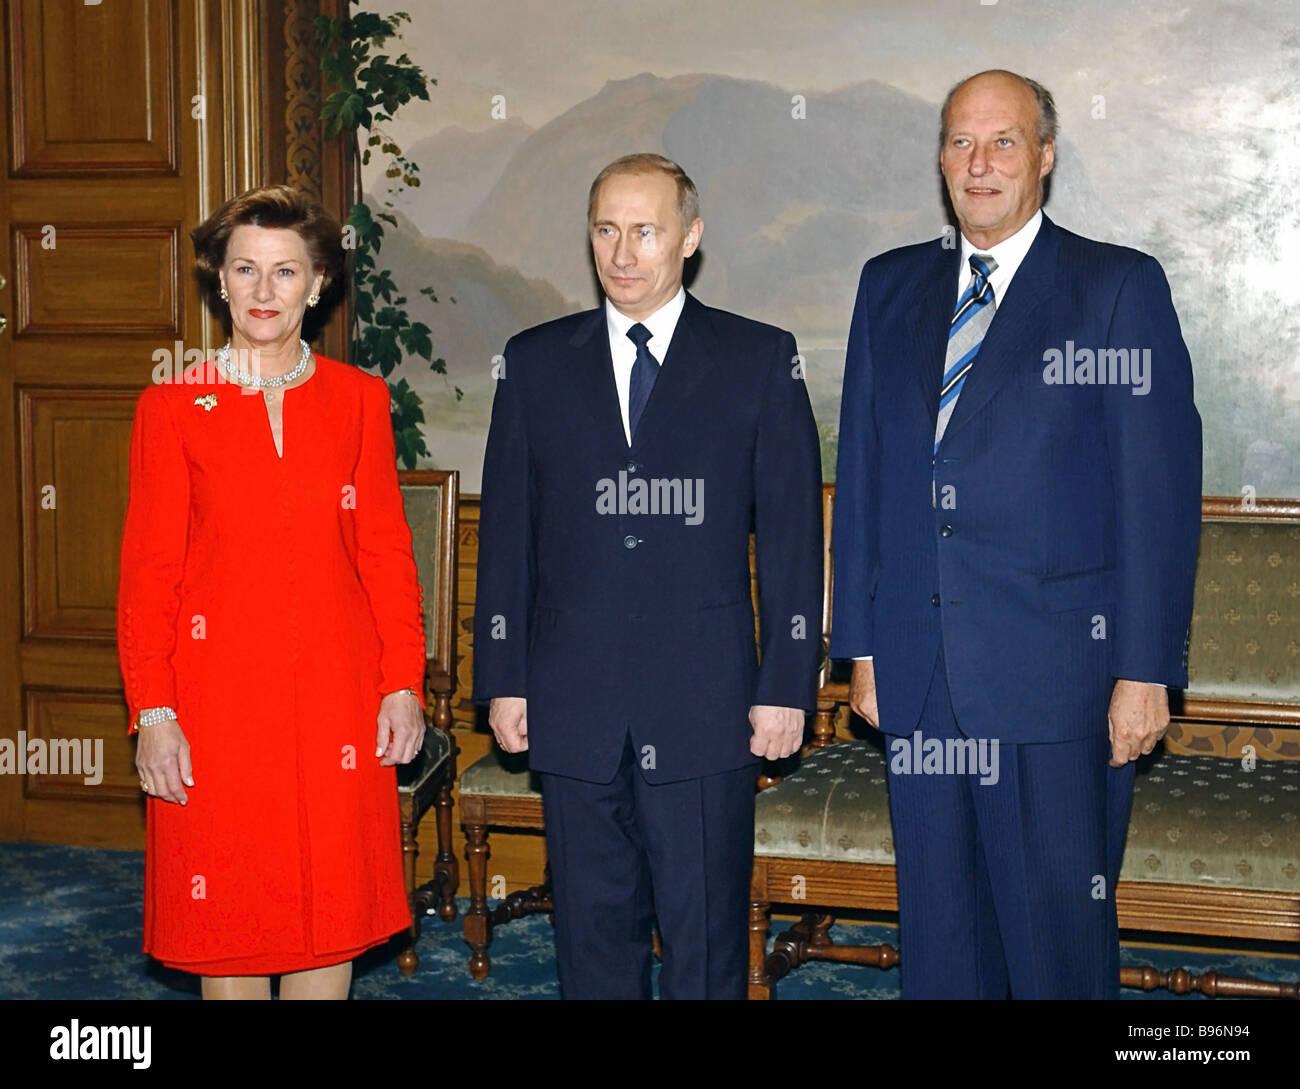 12 11 2002 OSLO Rabochaja poezdka Prezidenta RF Vladimira PUTINA v Norvegiju Korol KHARAL D V i Koroleva SONI Foto - Stock Image